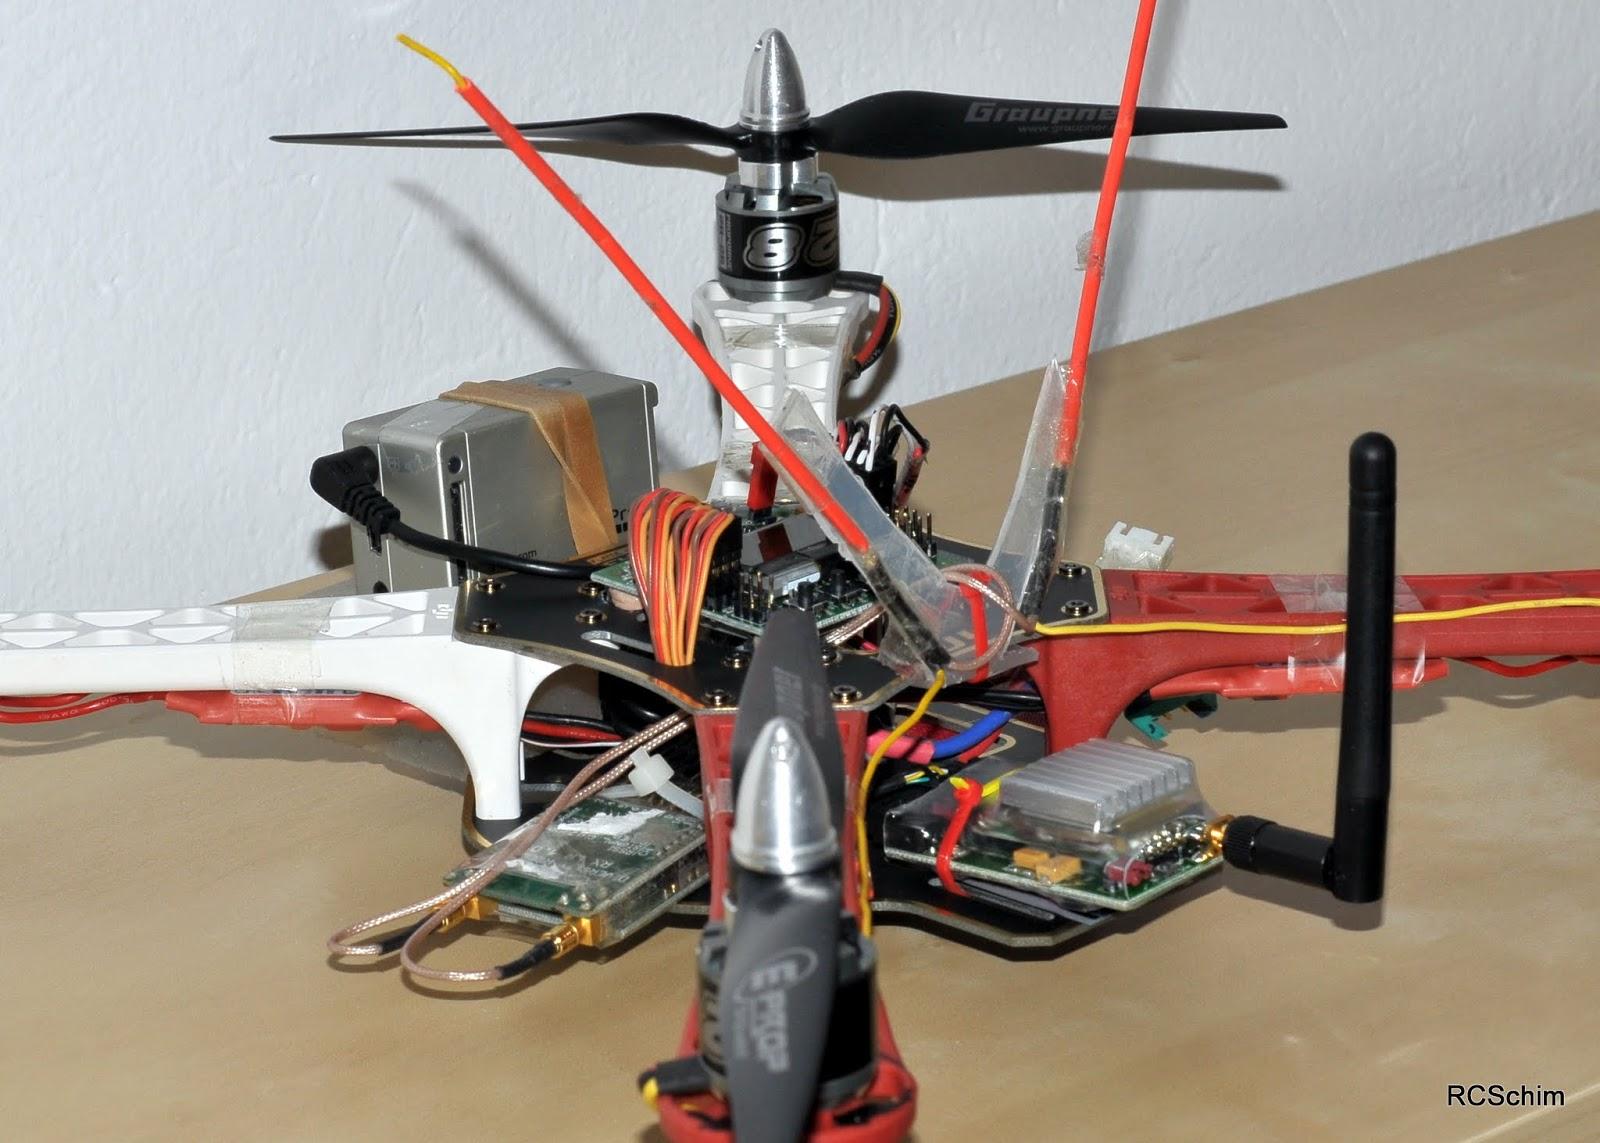 f450 dji flamewheel frame 50 kk2 controlboard hobbyking 30 4x 18amp turnigy plush escs 12 each 4x motors 15 each 2x graupner eprops 9x5 54 each